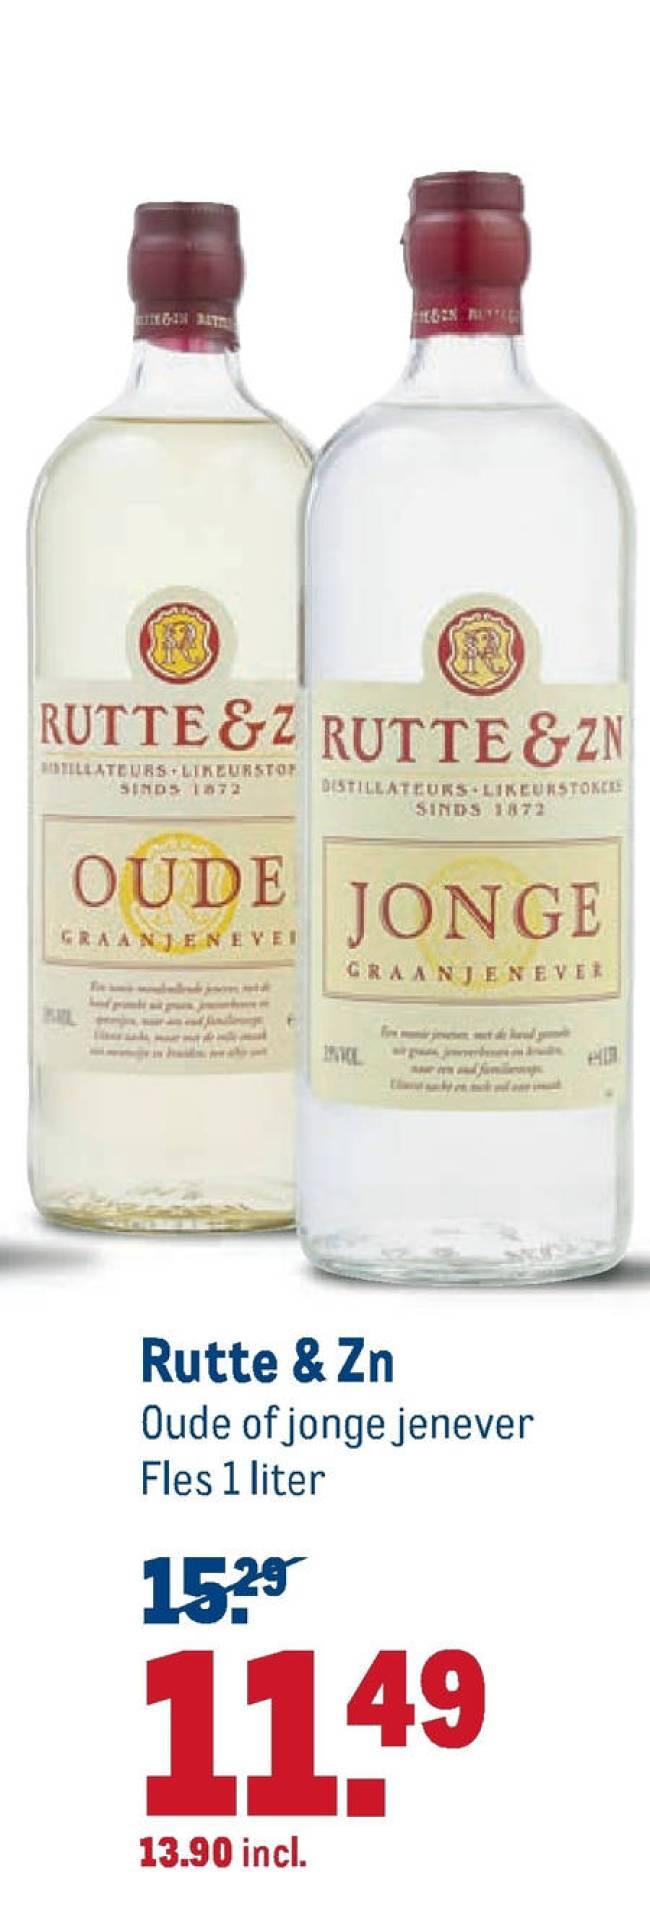 Rutte & Zn Oude of Jonge jenever (1) (foto Voordeelmuis)